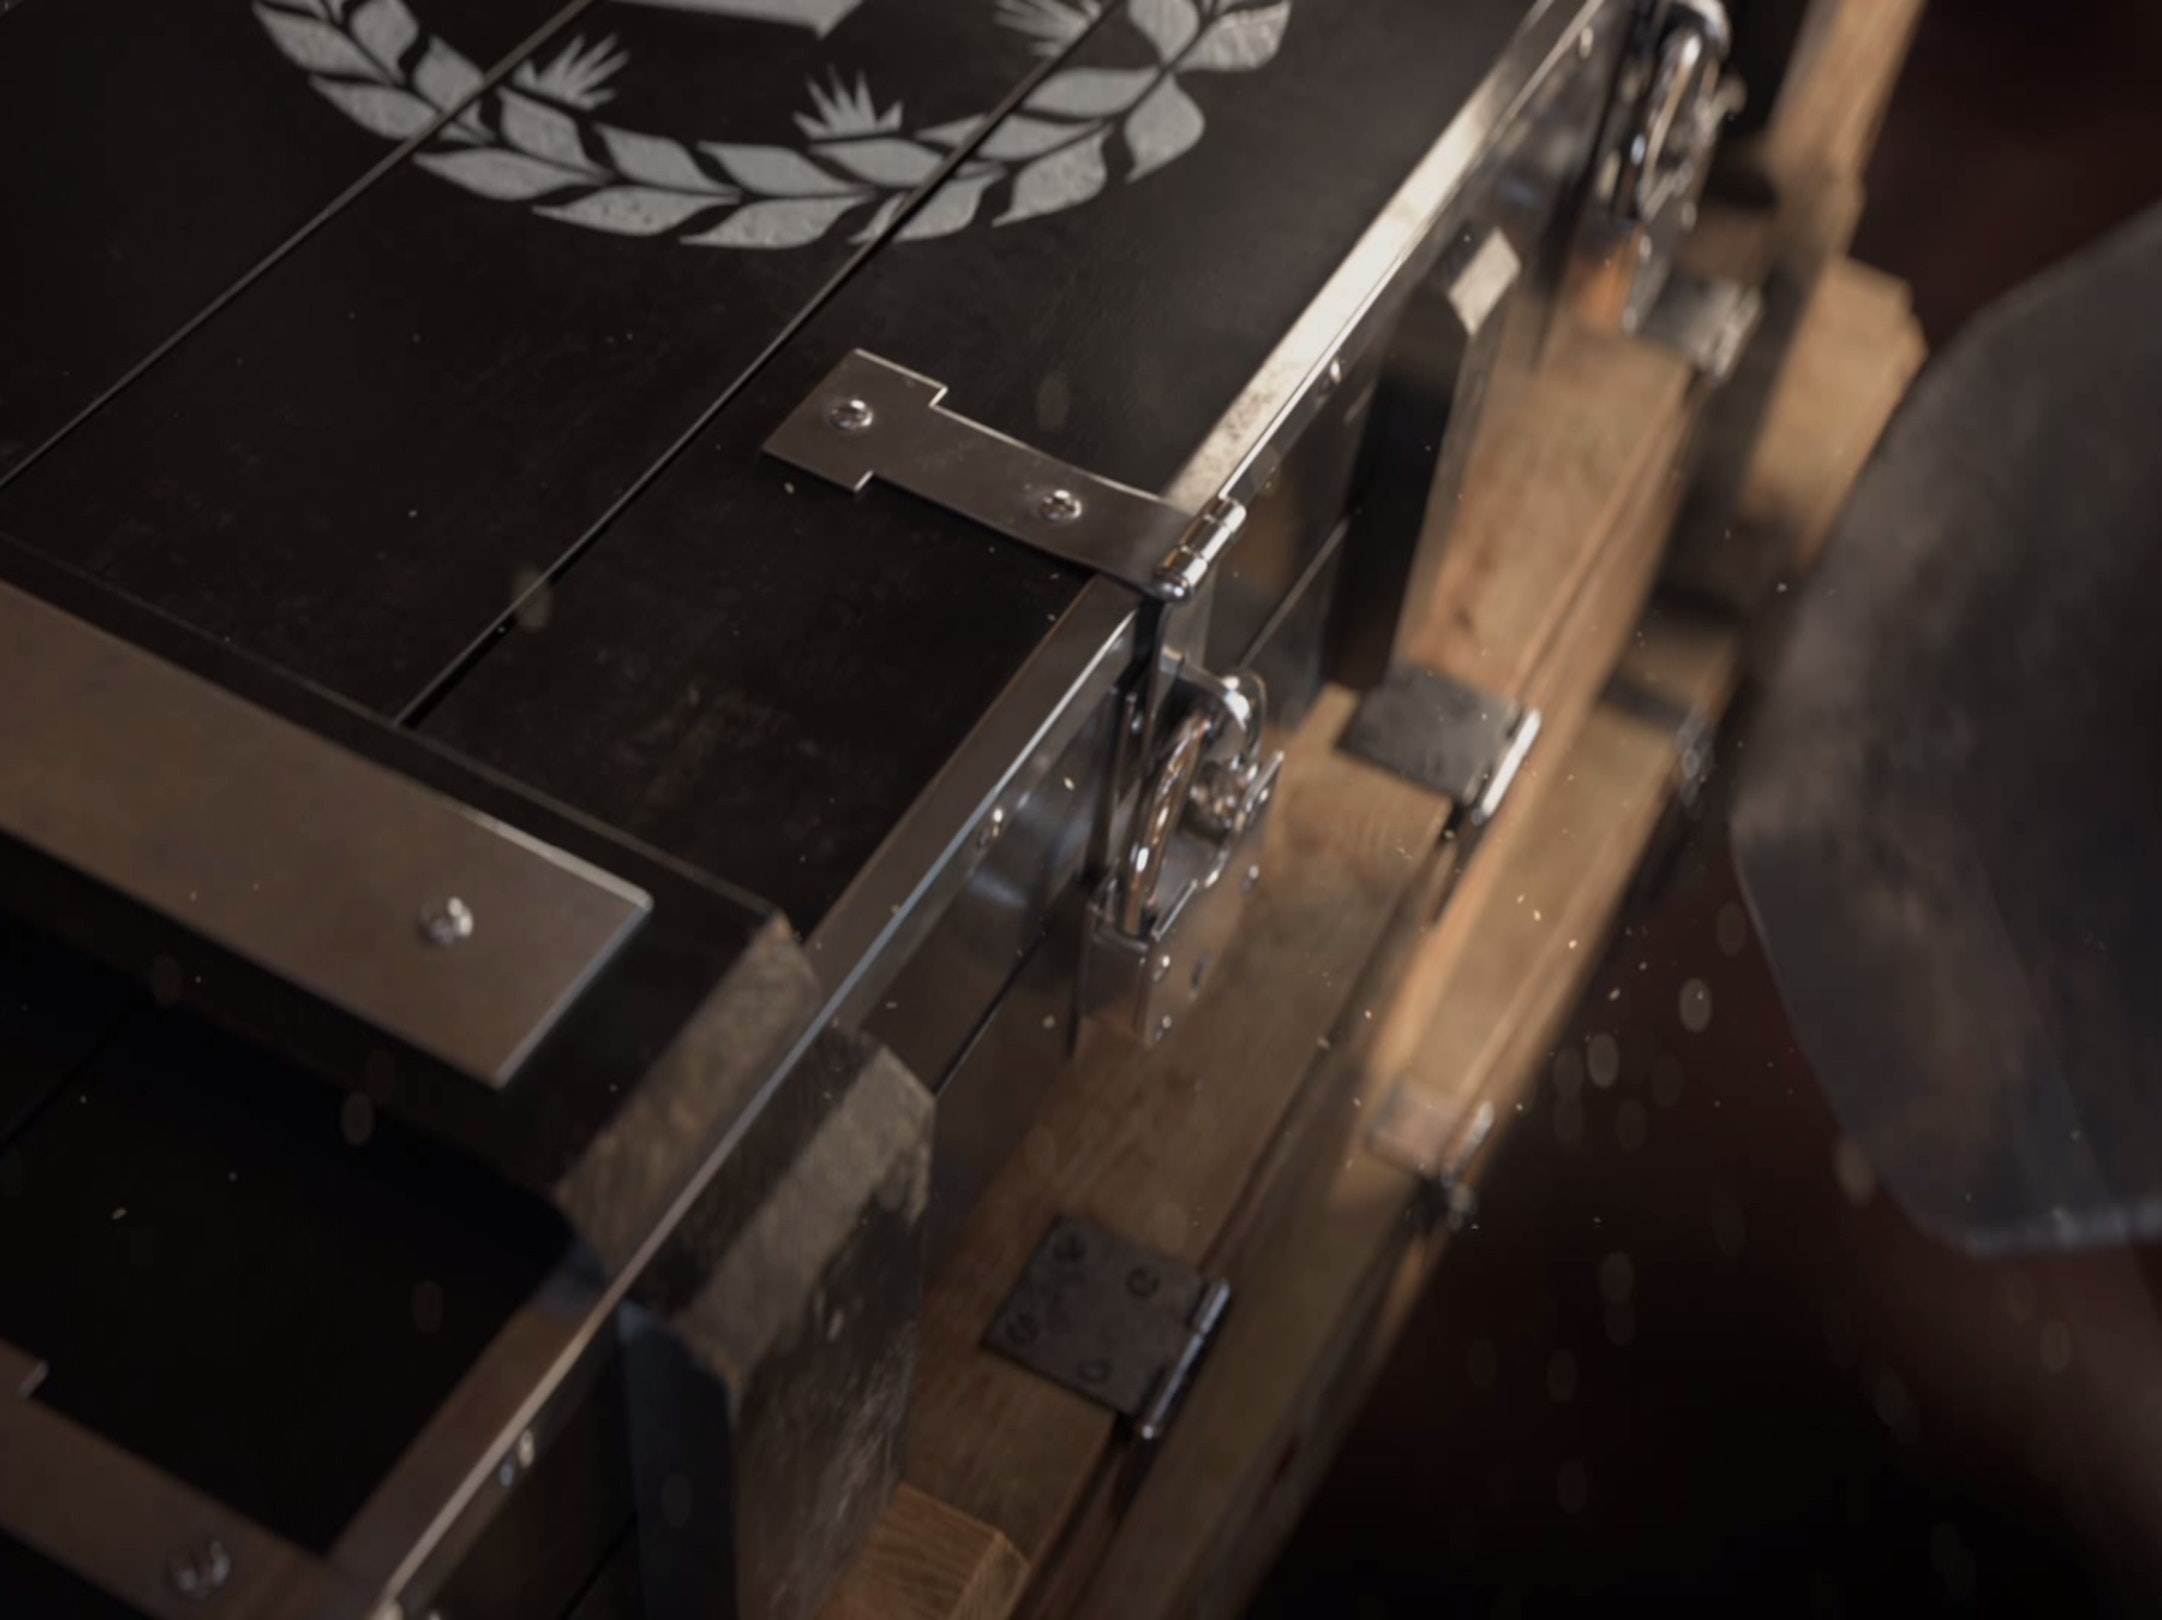 How Battlepacks Work in 'Battlefield 1'